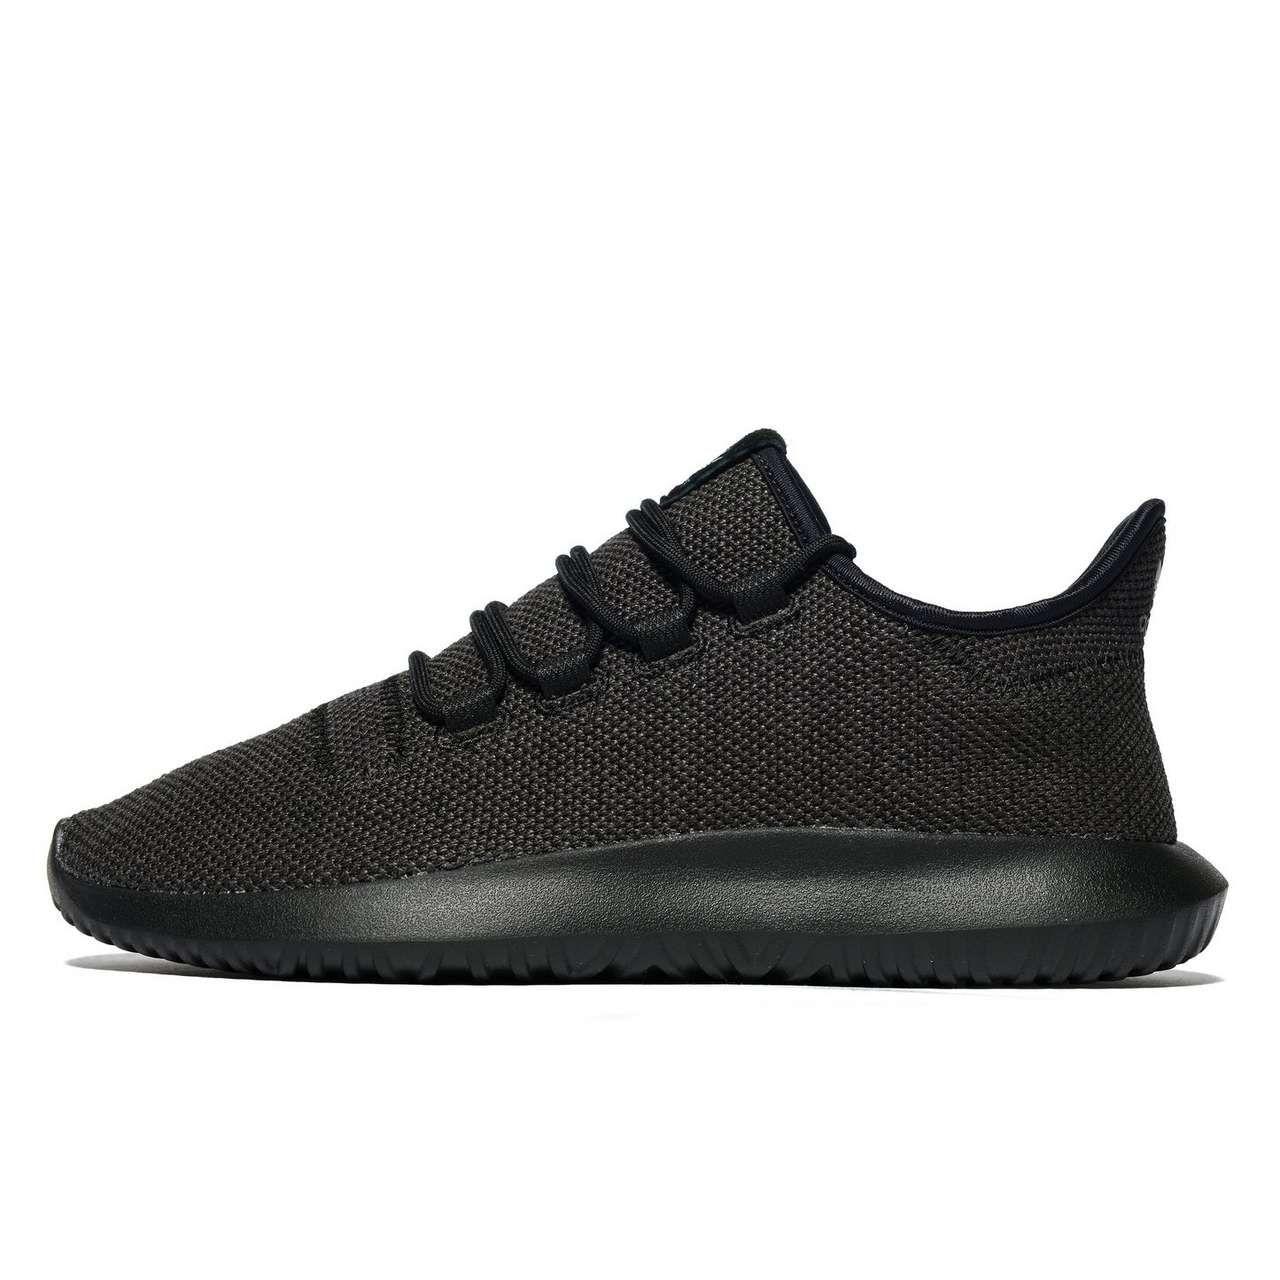 adidas Originals Tubular Shadow Sportmode, Schwarze